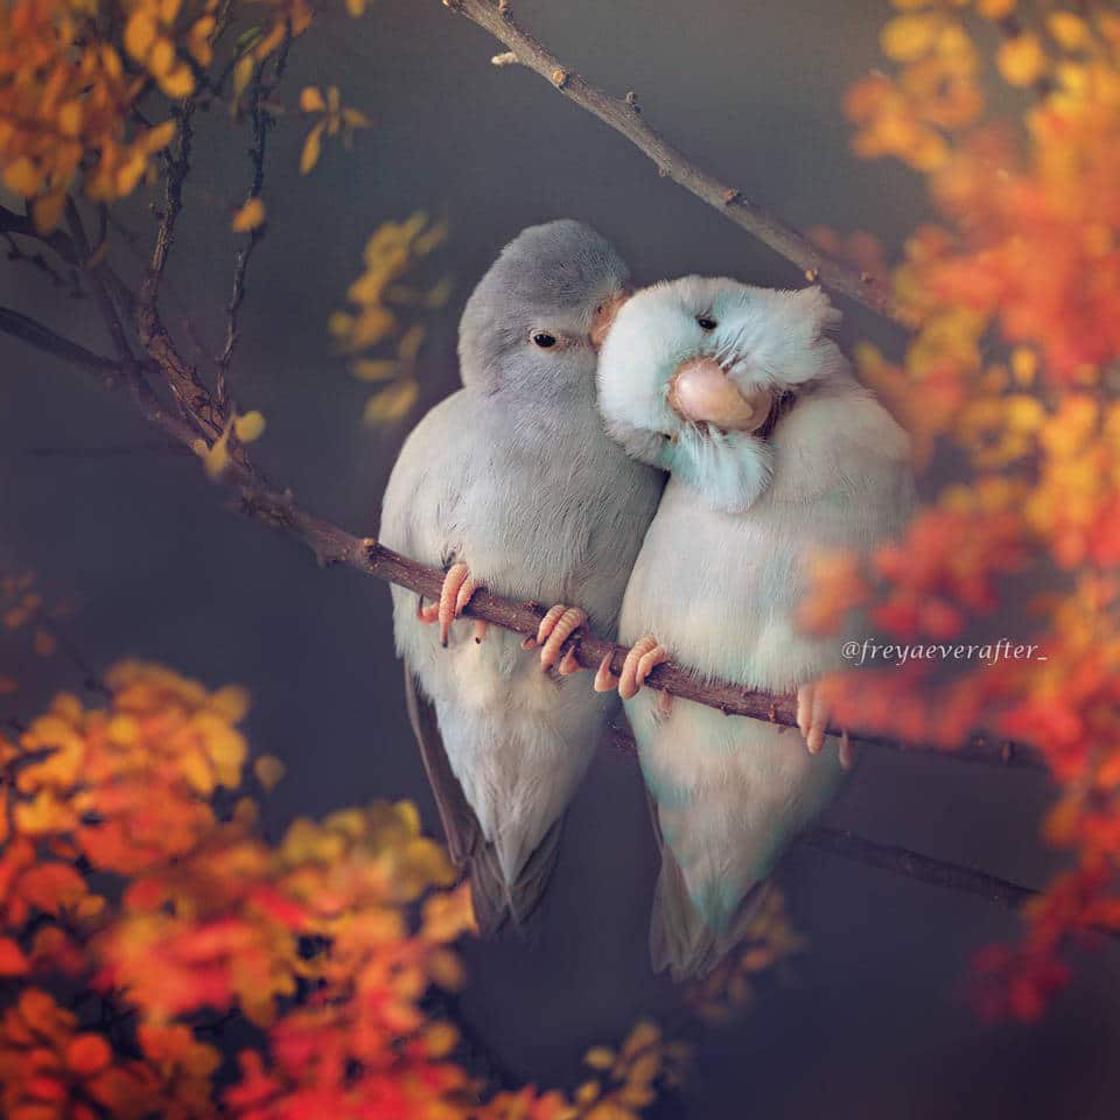 Love Birds – When a photographer captures love between her parakeets